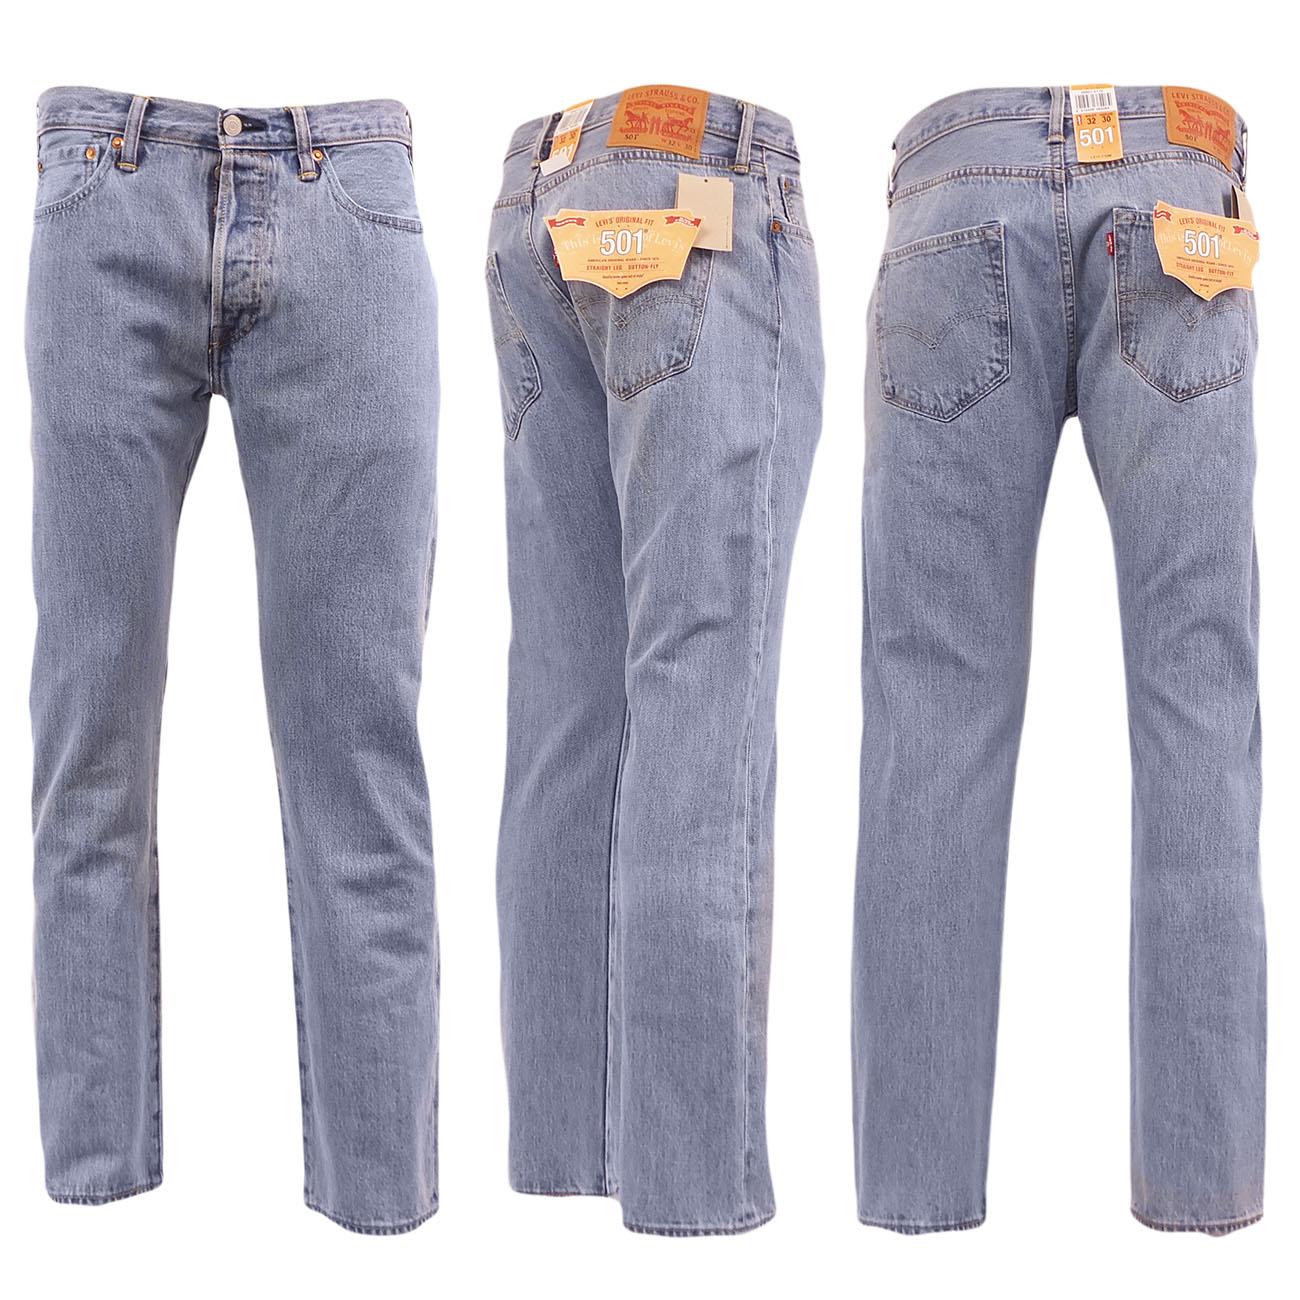 Sentinel Levi 501 Jeans Original Straight Leg Fit Mens Denim Waist 28 30 32  34 36 38 c7e36ada90